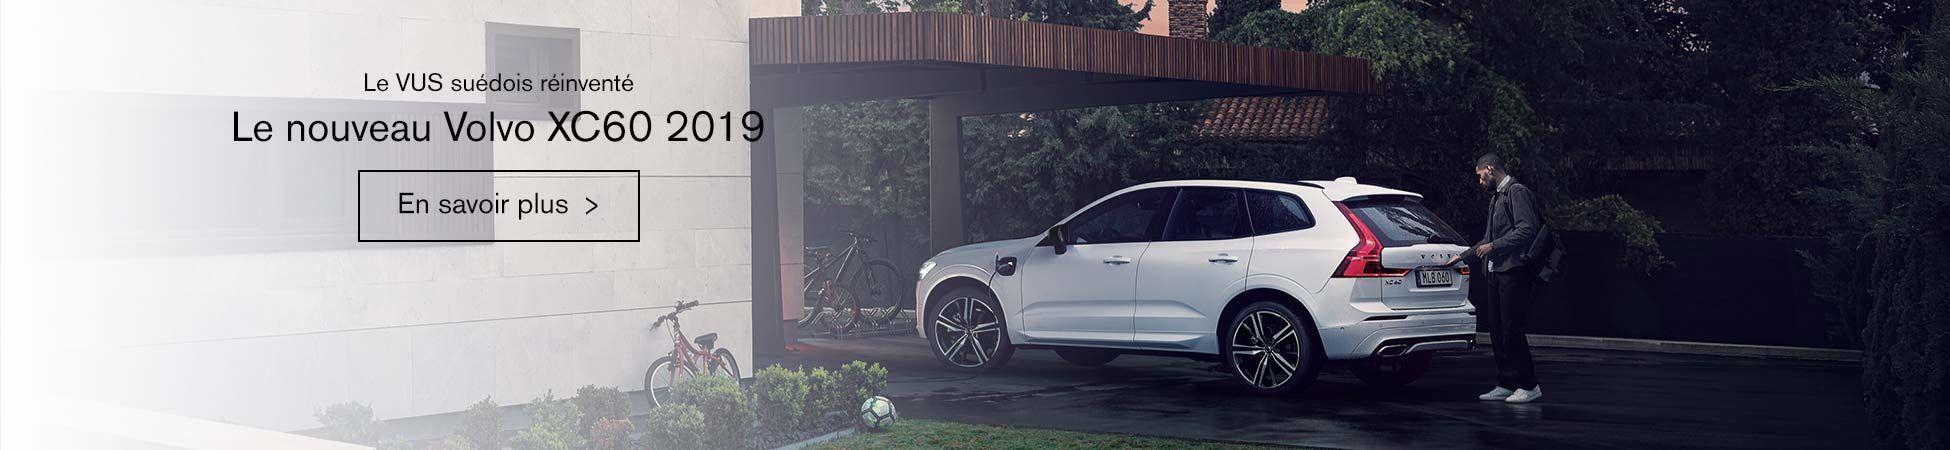 Volvo Xc60 2019 - Slideshow